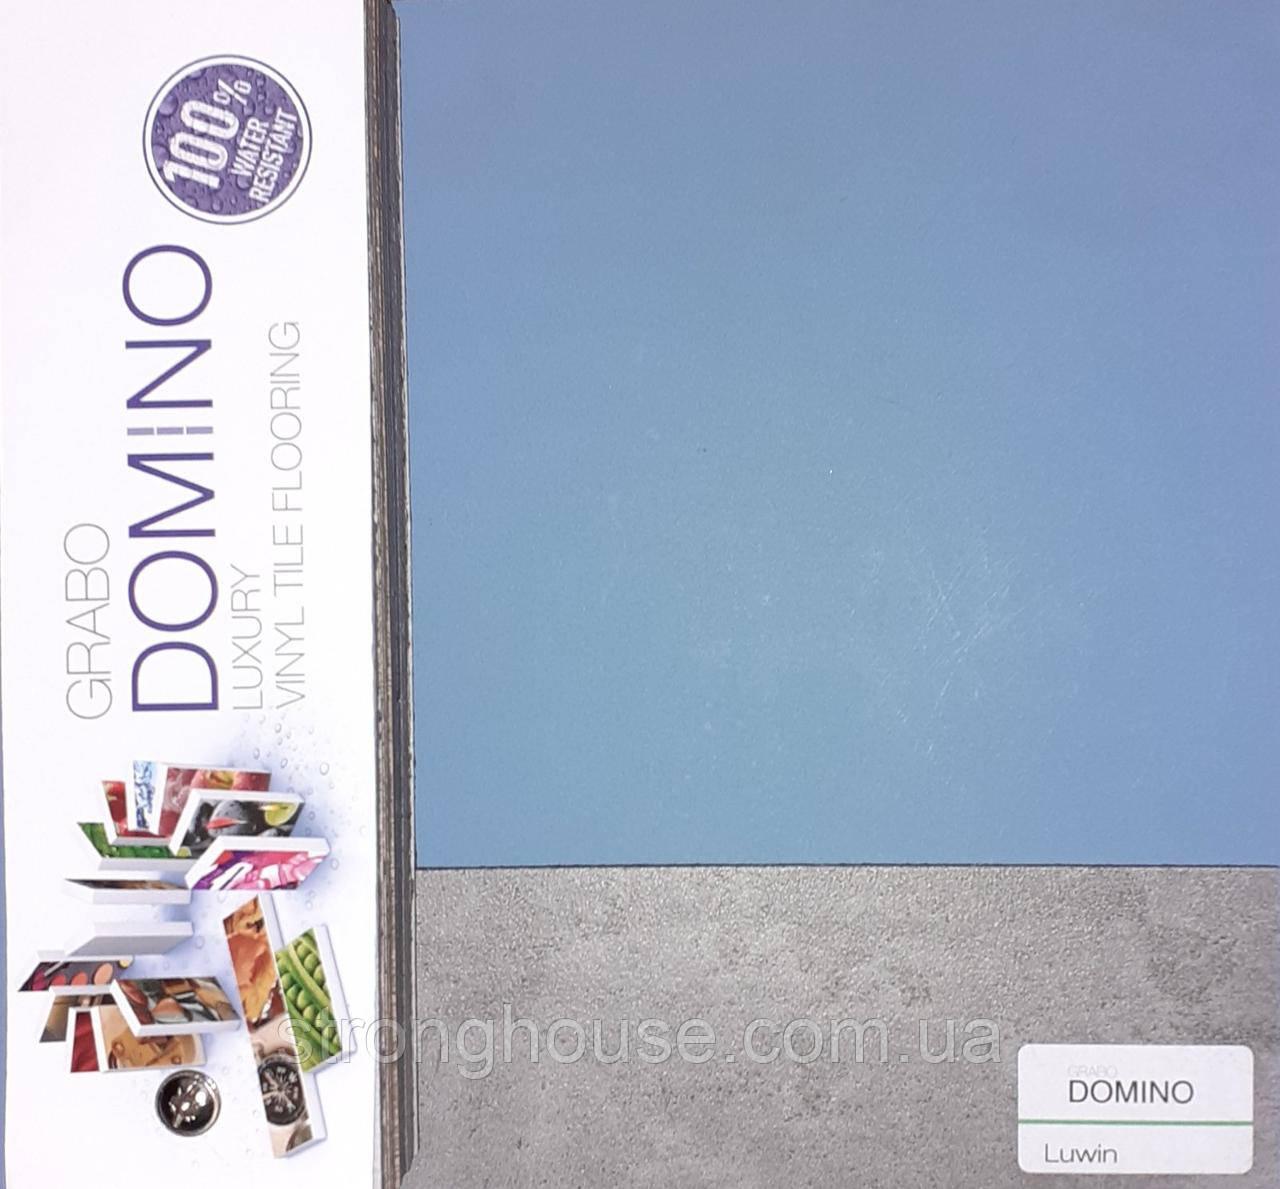 Grabo Domino Luwin ПВХ плитка Грабо Домино Лувин